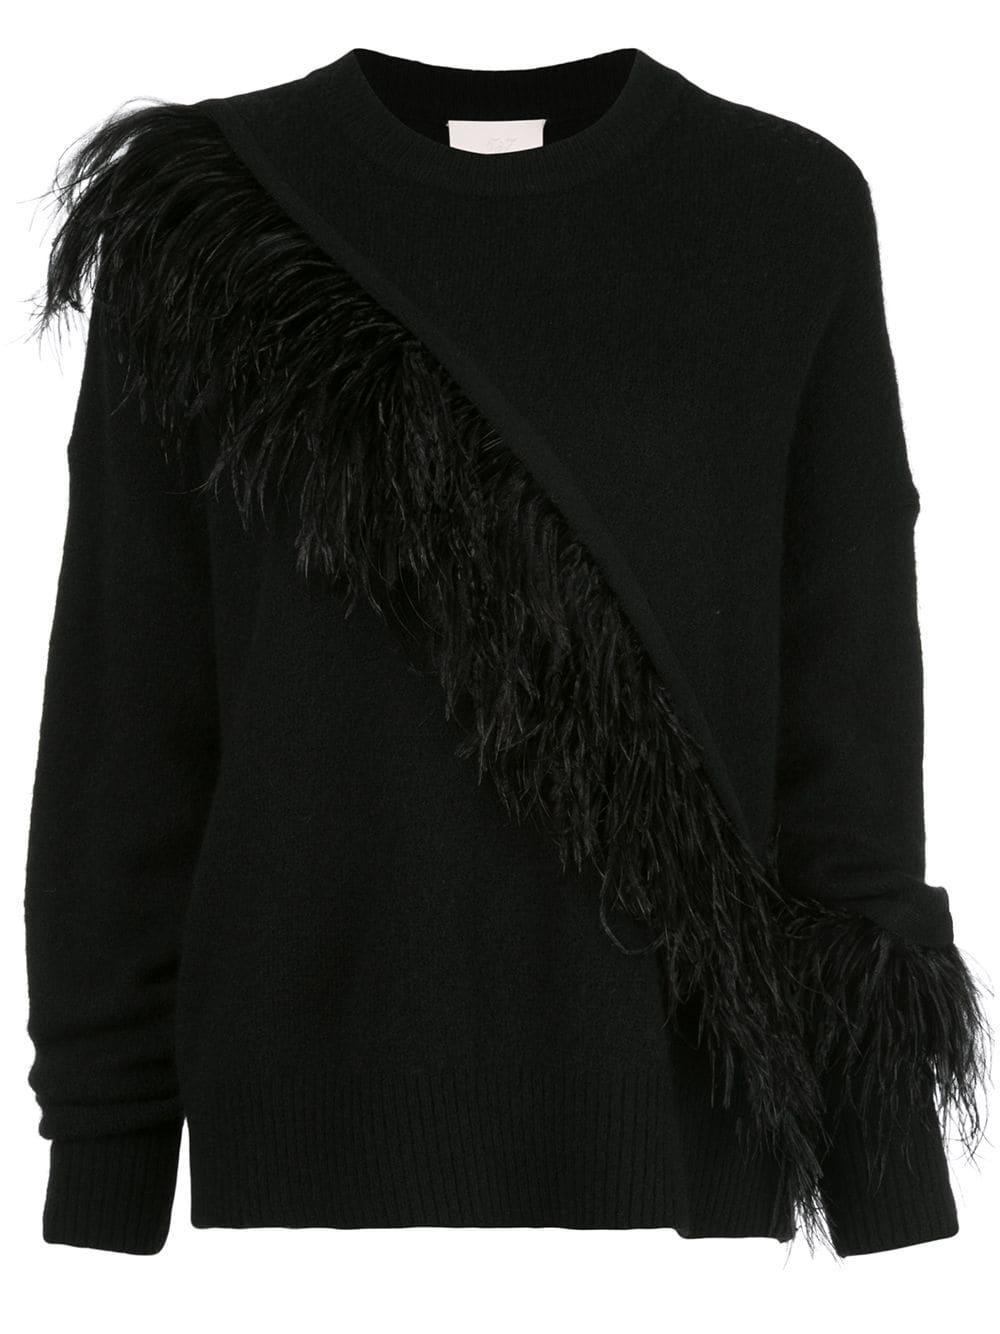 Merritt Feather Detail Pullover Sweater